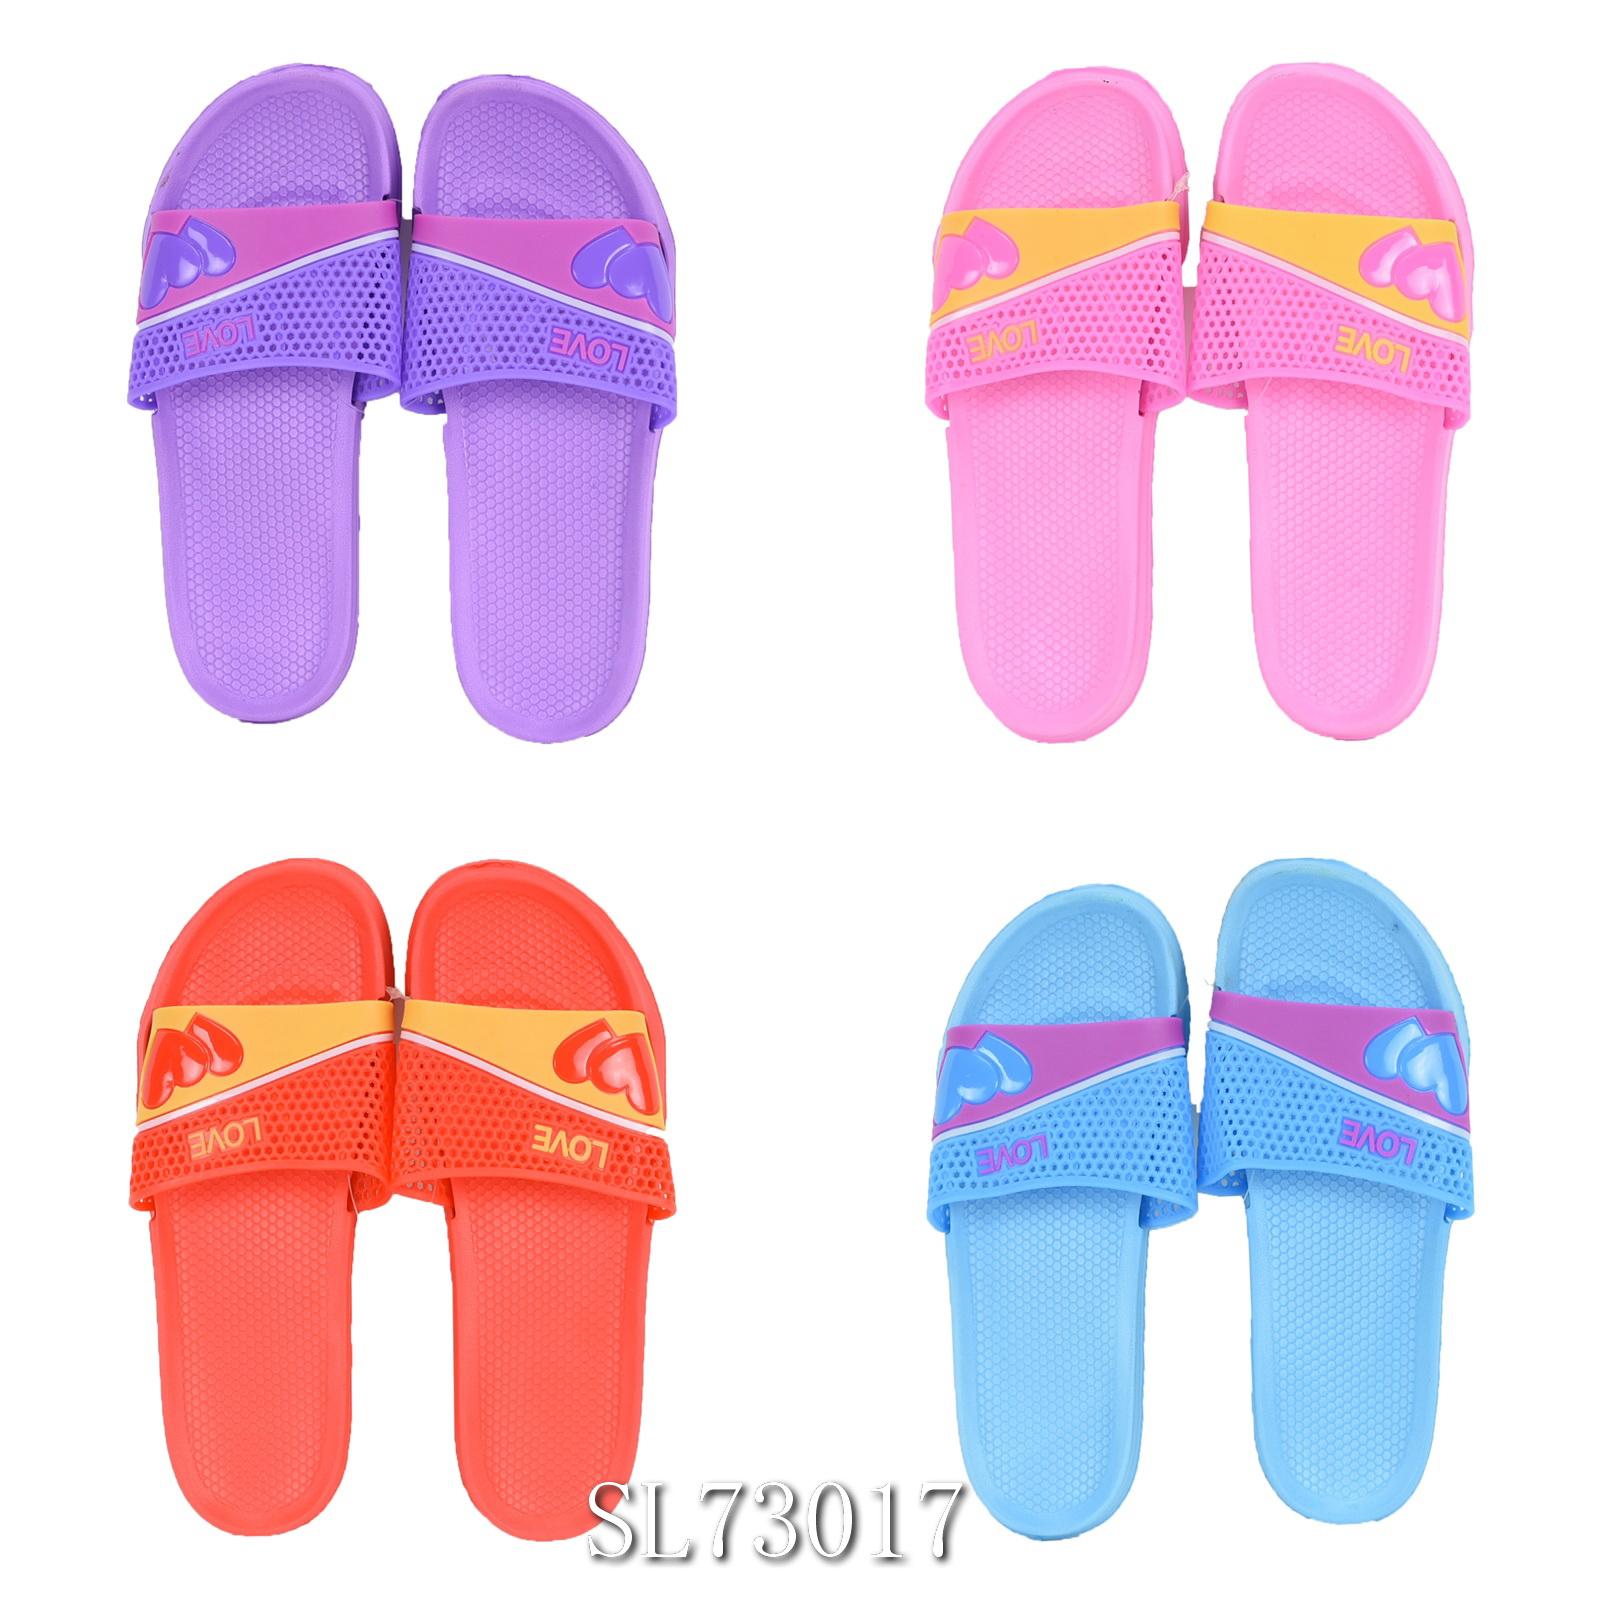 Wholesale SHOES - Women's Slip On Sandals - 60 Pairs